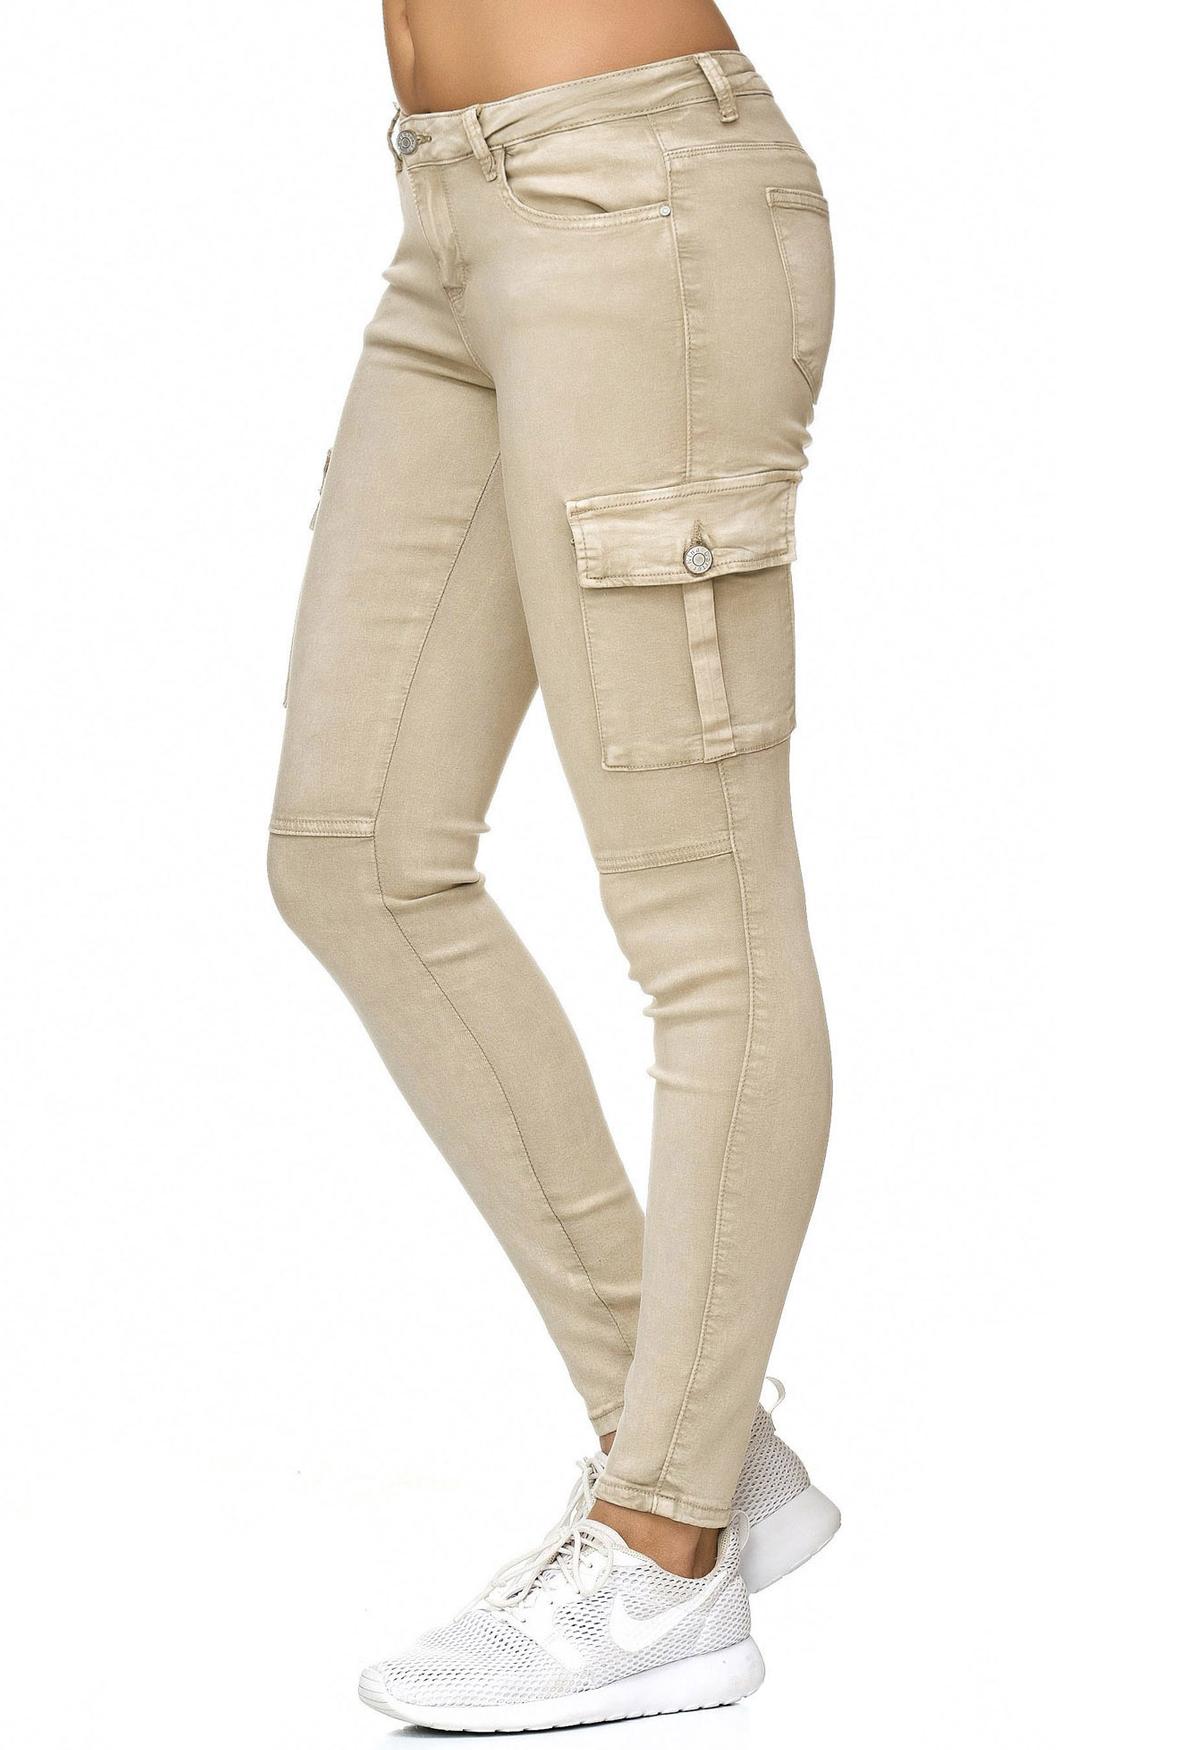 Damen Cargo Hose Stretch Treggings Vintage Jeggings Skinny Nina Carter Röhre Neu